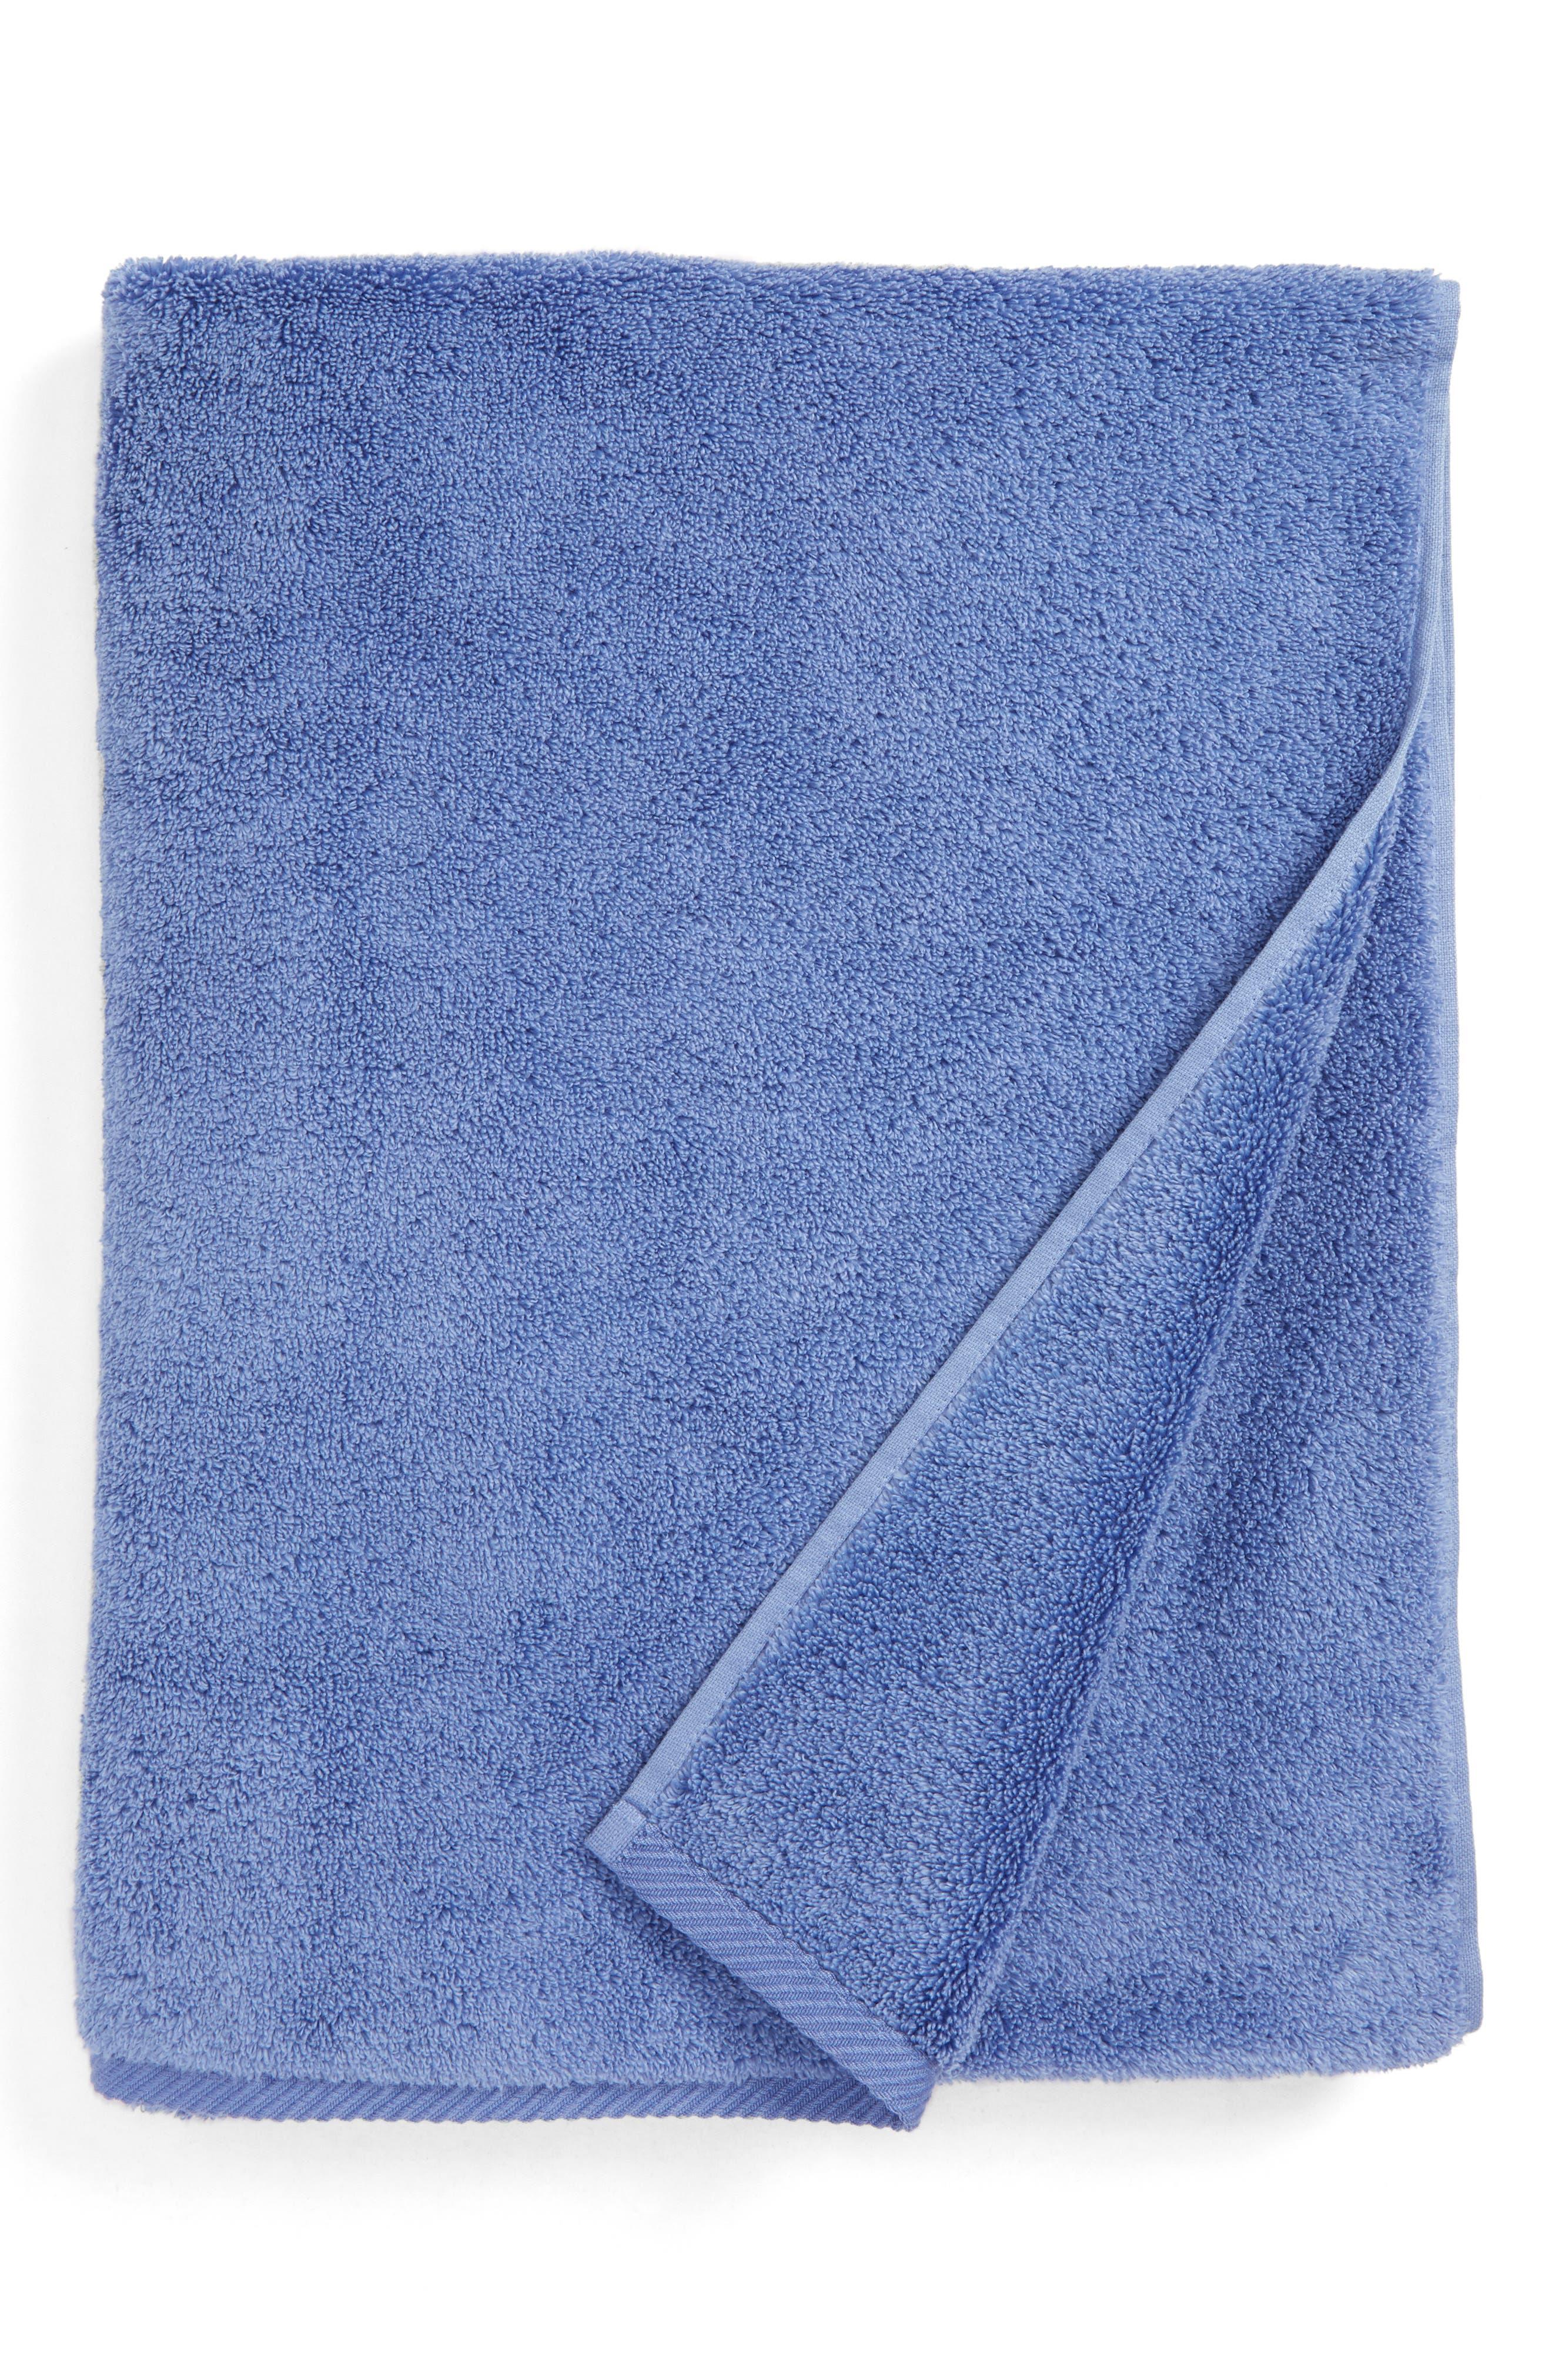 MATOUK Milagro Bath Towel, Main, color, PERIWINKLE